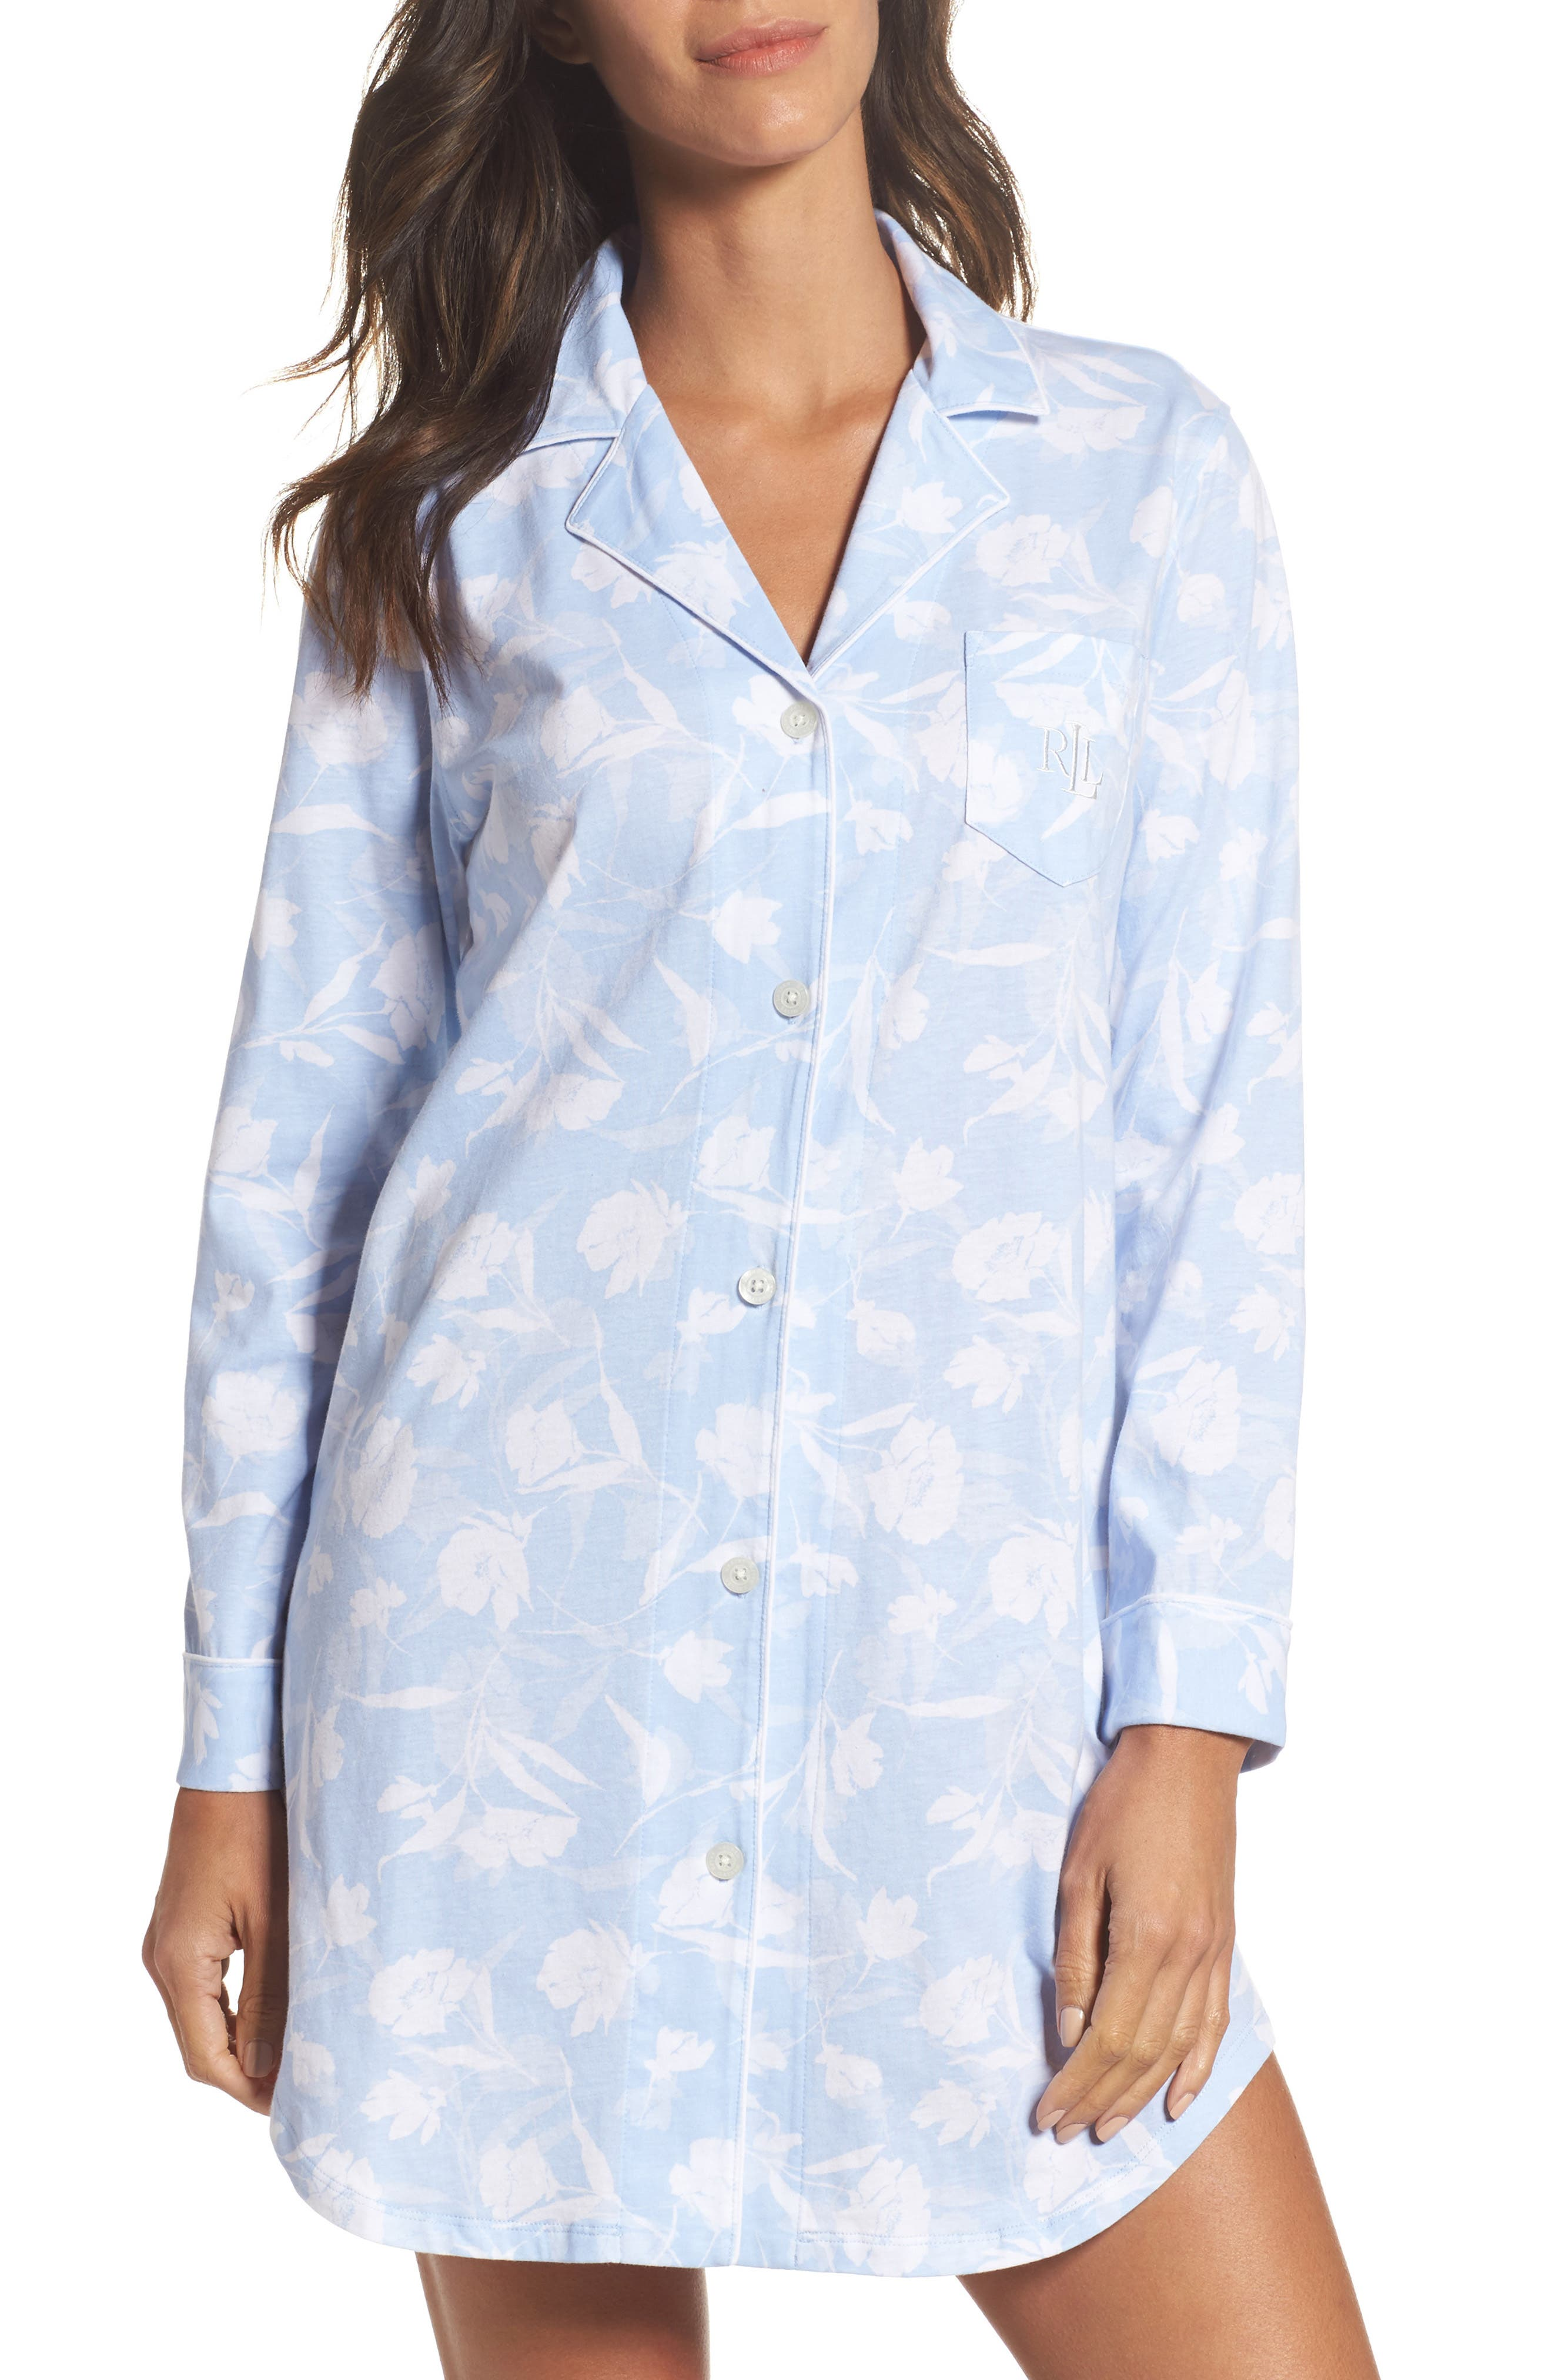 Notch Collar Sleep Shirt,                             Main thumbnail 1, color,                             Pale Blue Monotone Floral